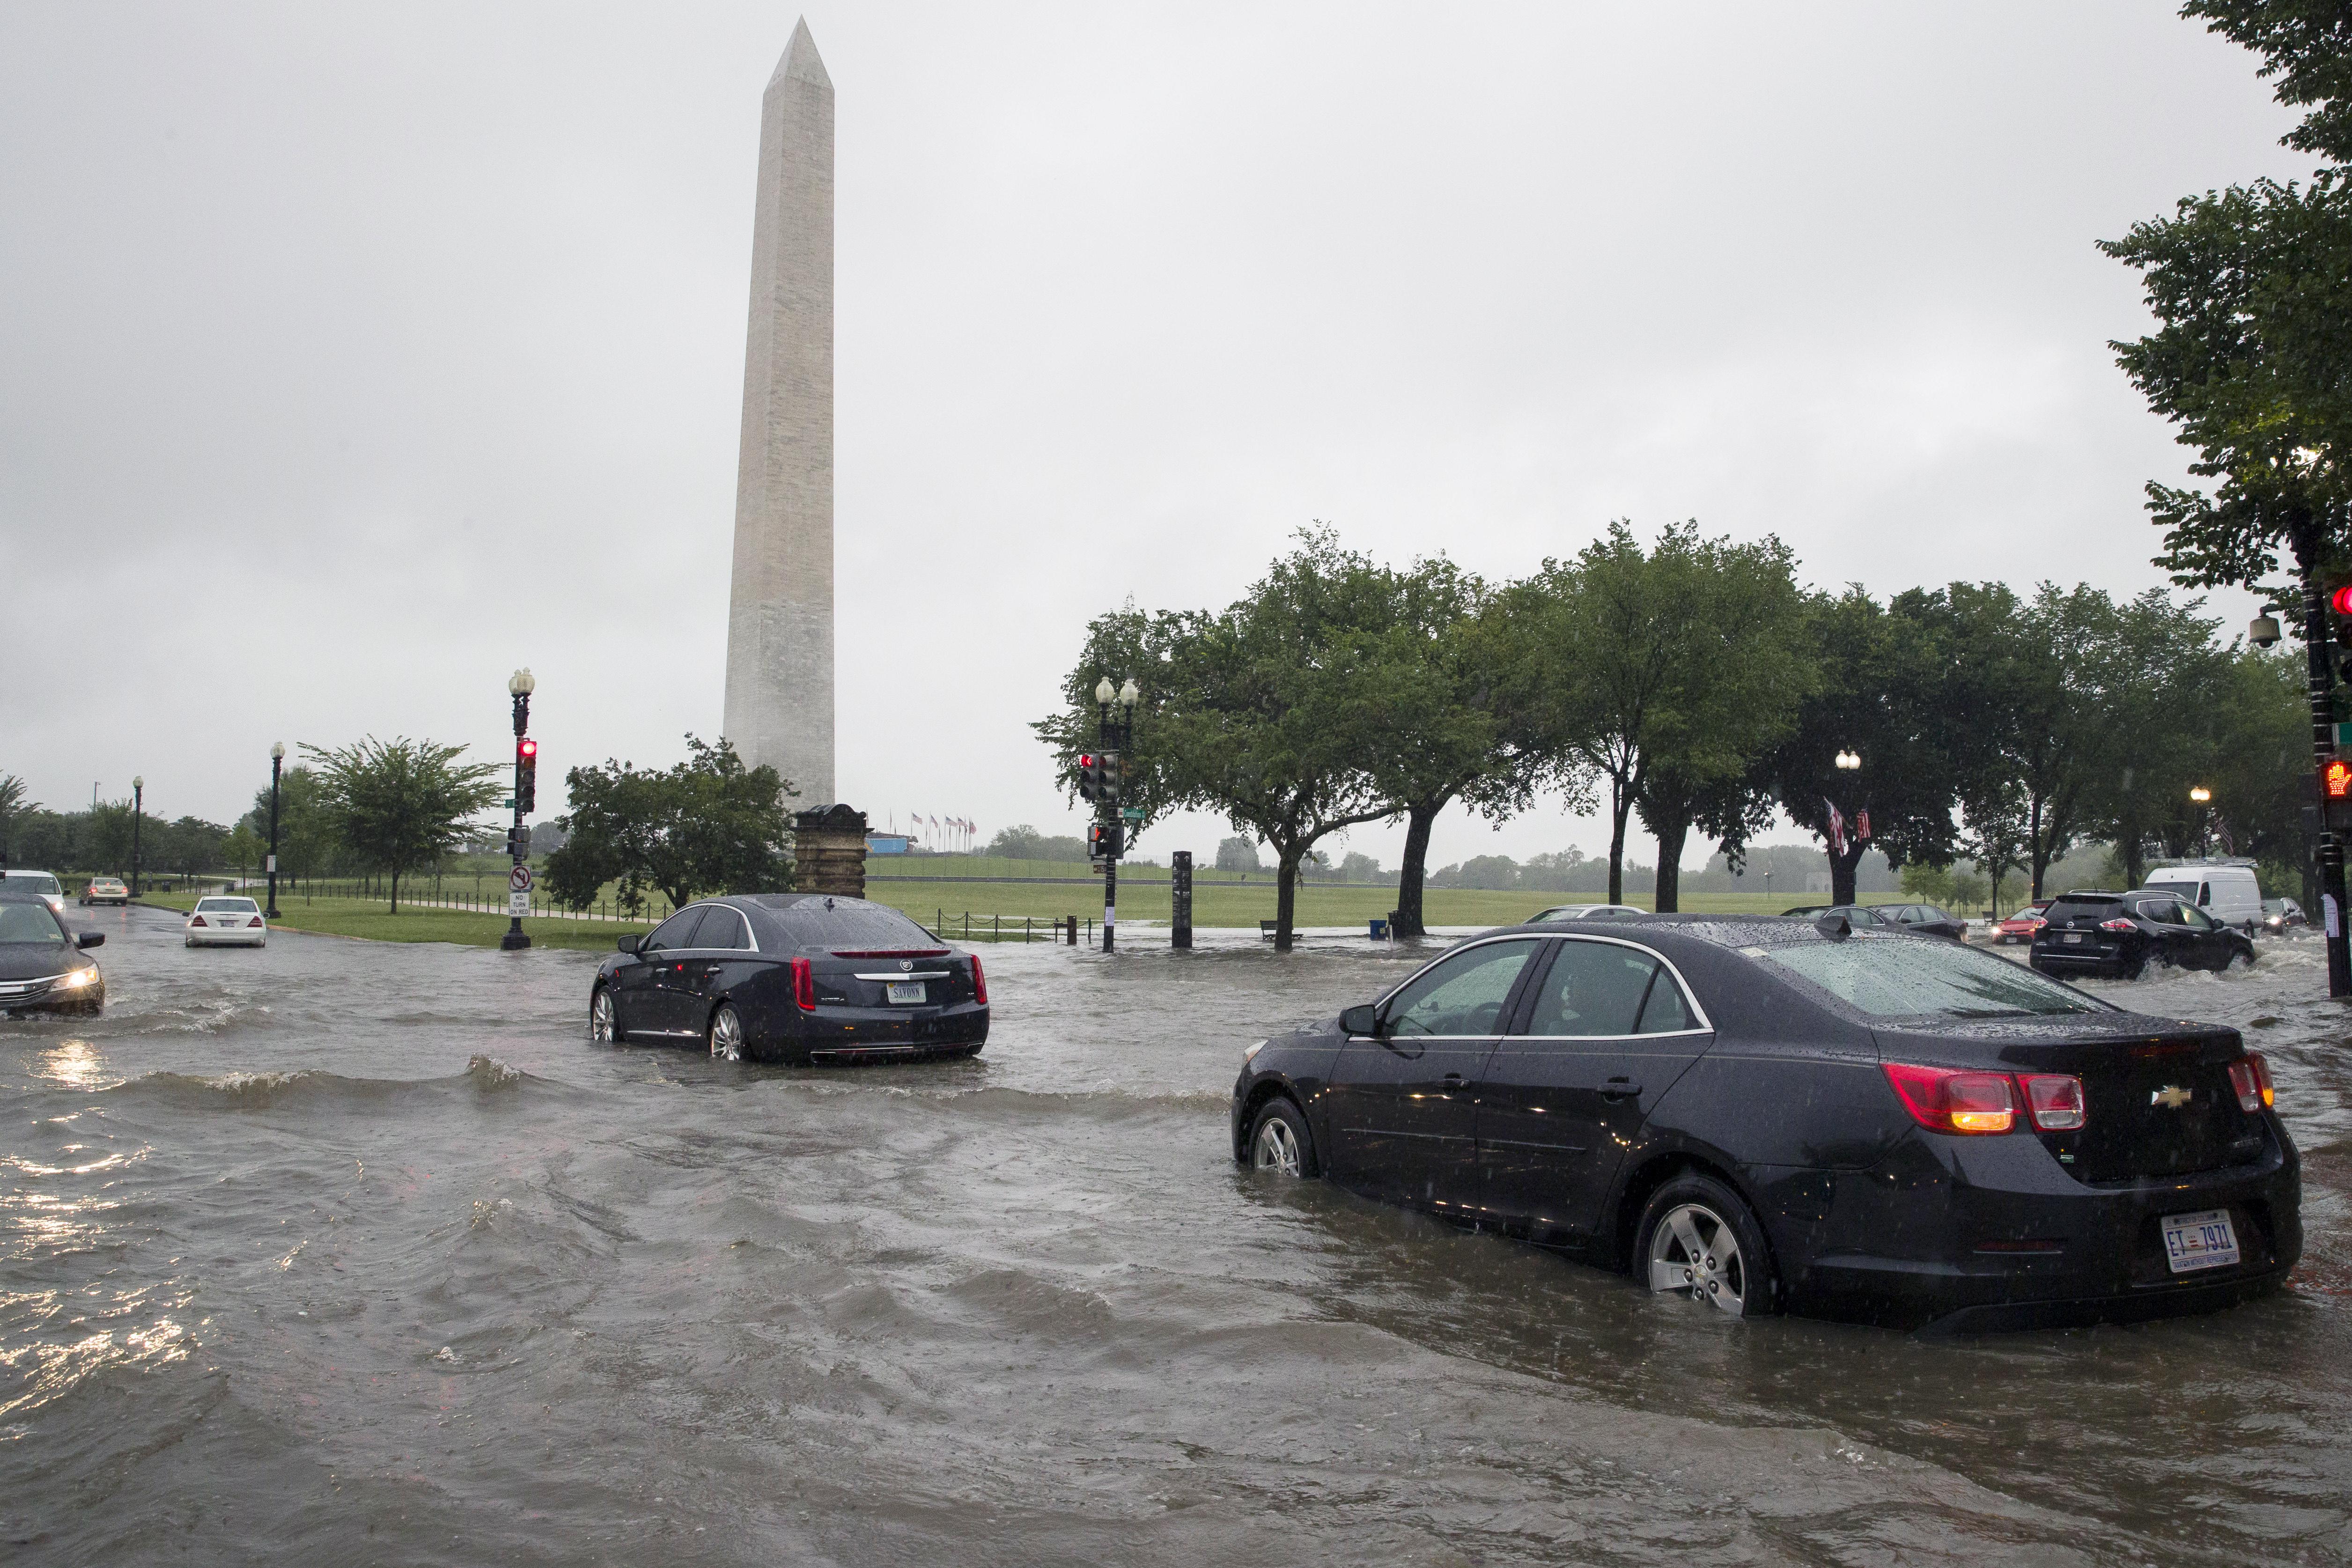 Rains strand Washington drivers, flood White House basement